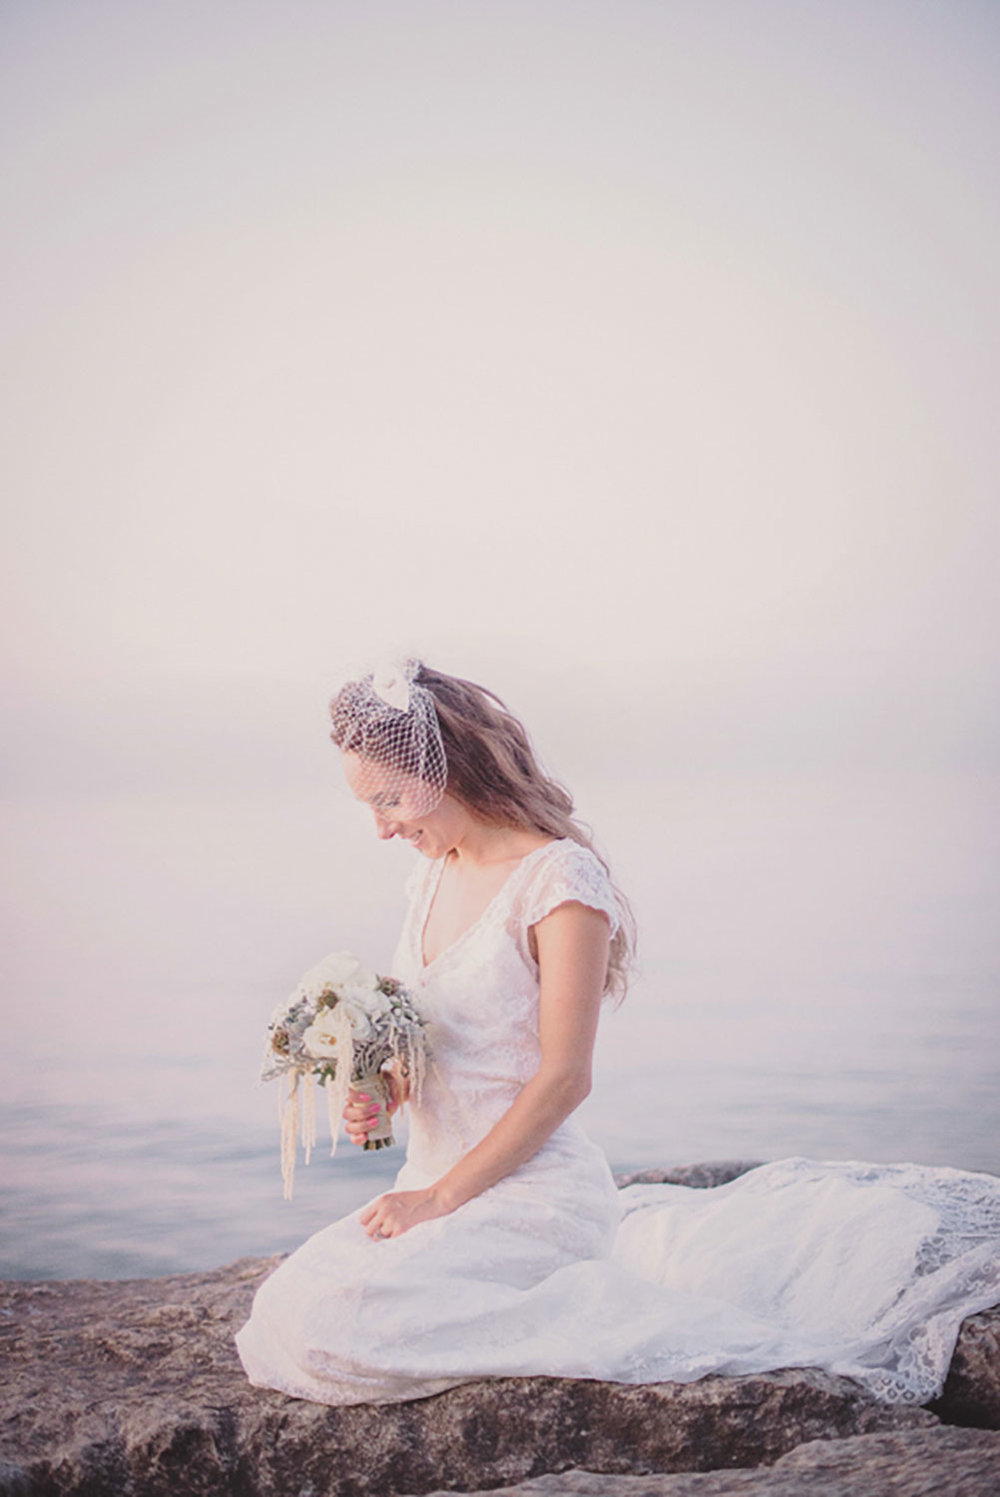 Grimbsy-Beach-Editorial-Vineyard-Bride-photo-by-Destiny-Dawn-Photography-028.JPG